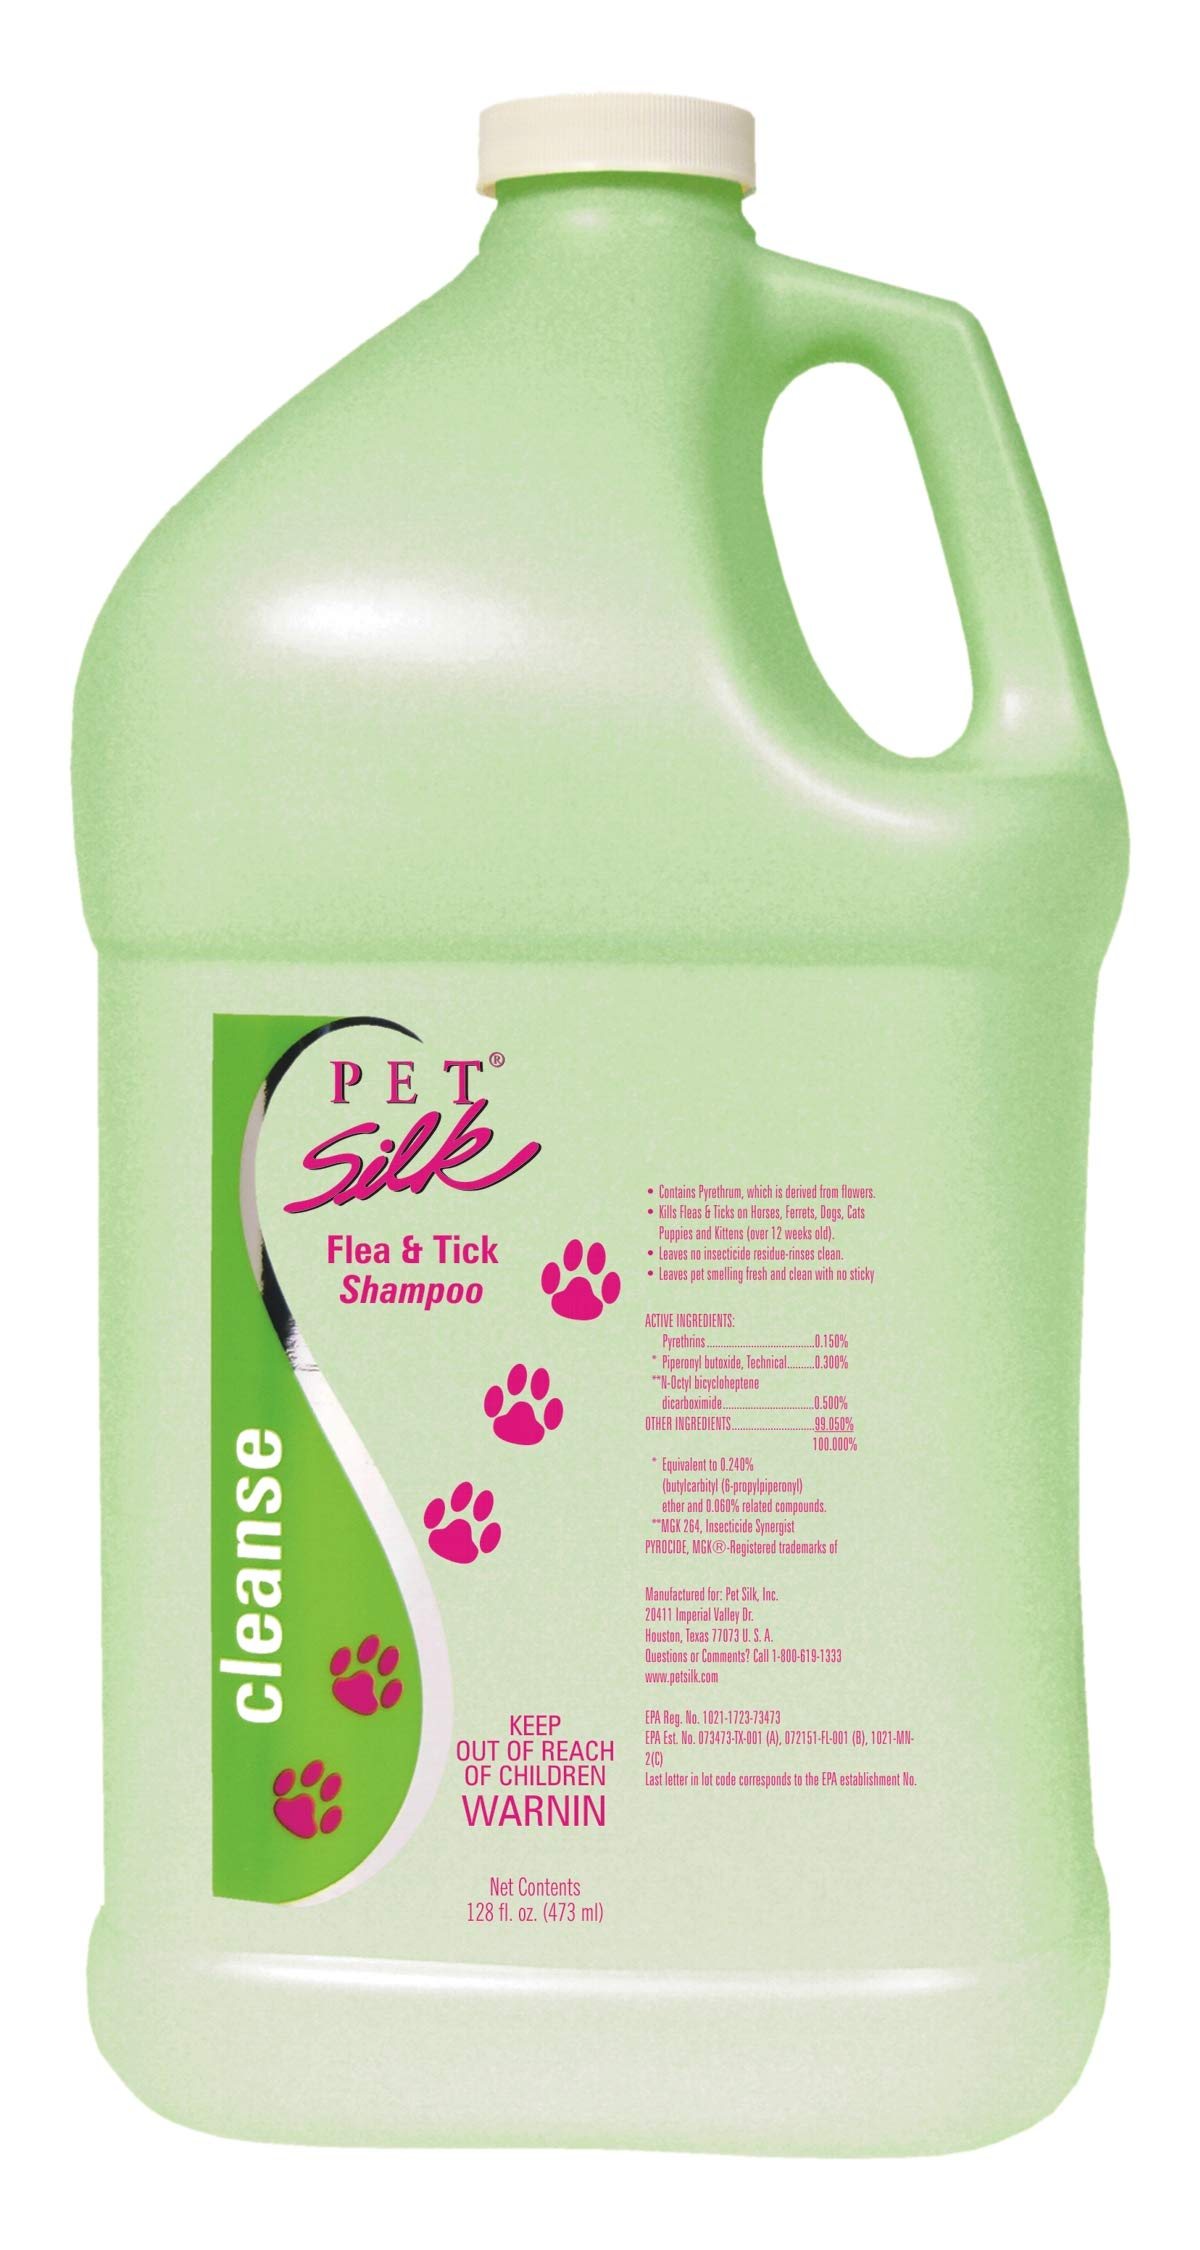 PET SILK Flea and Tick Shampoo by PET SILK